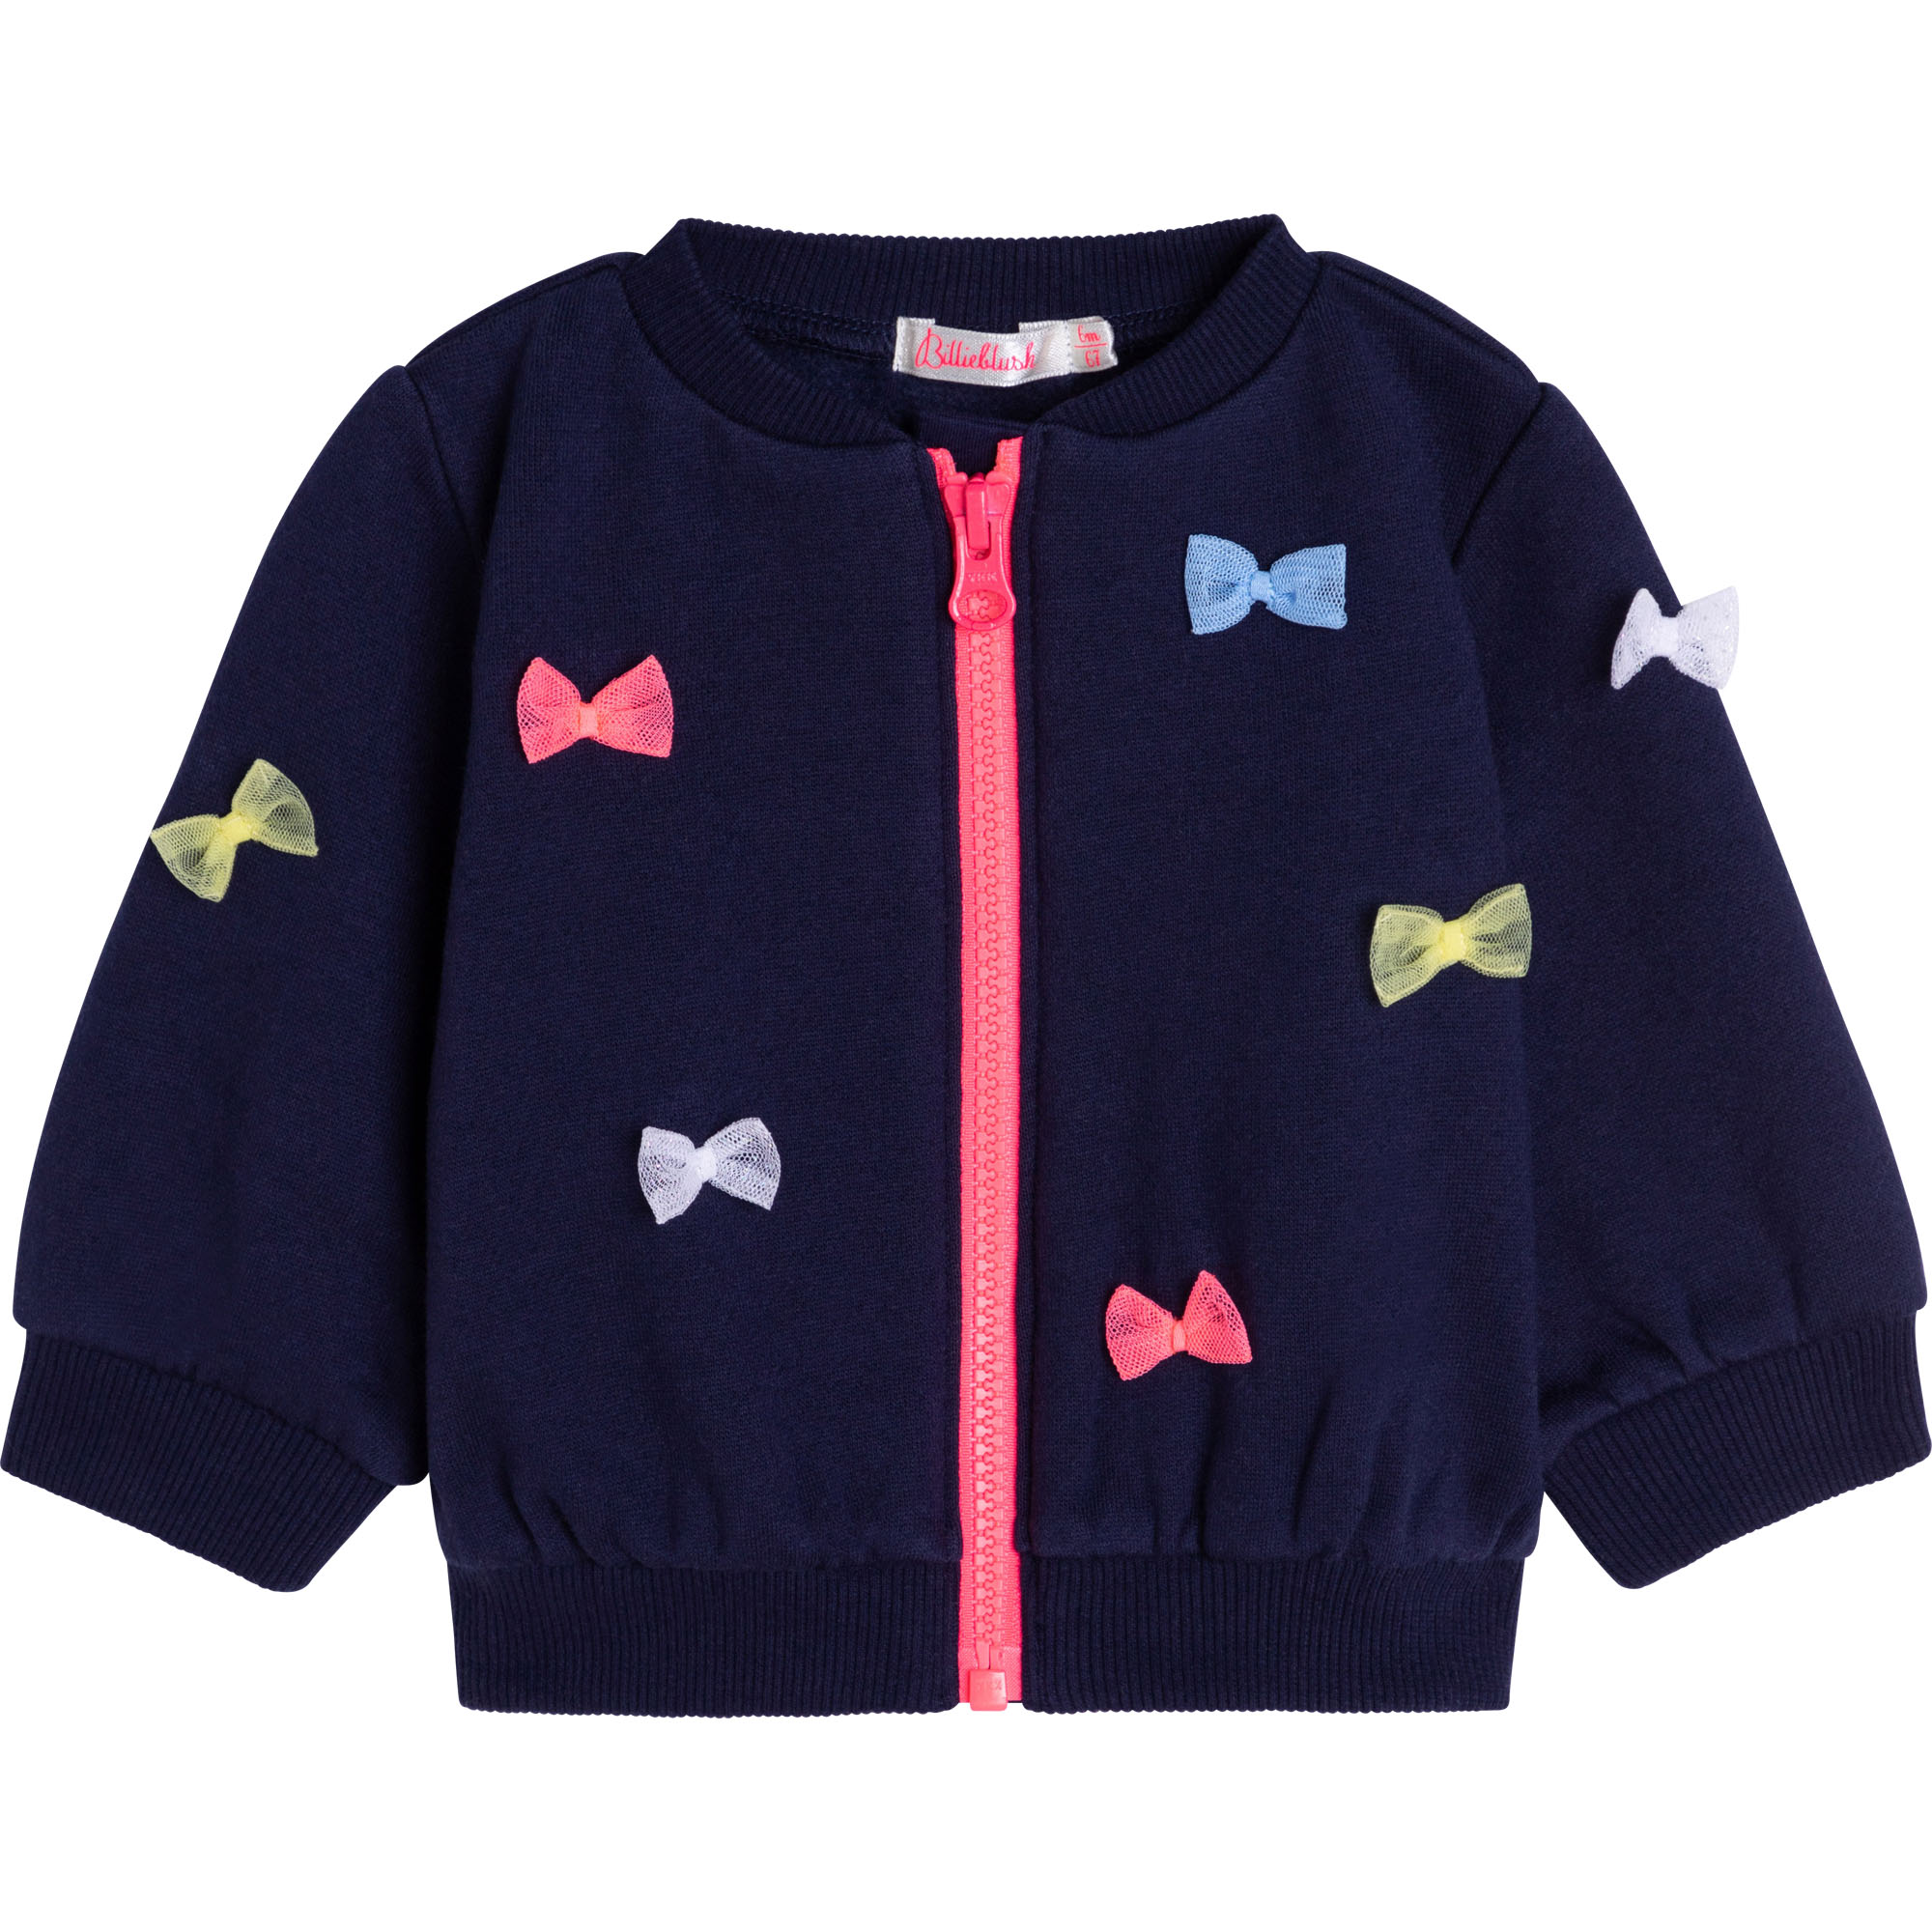 Zipped fleece sweatshirt with bows BILLIEBLUSH for GIRL